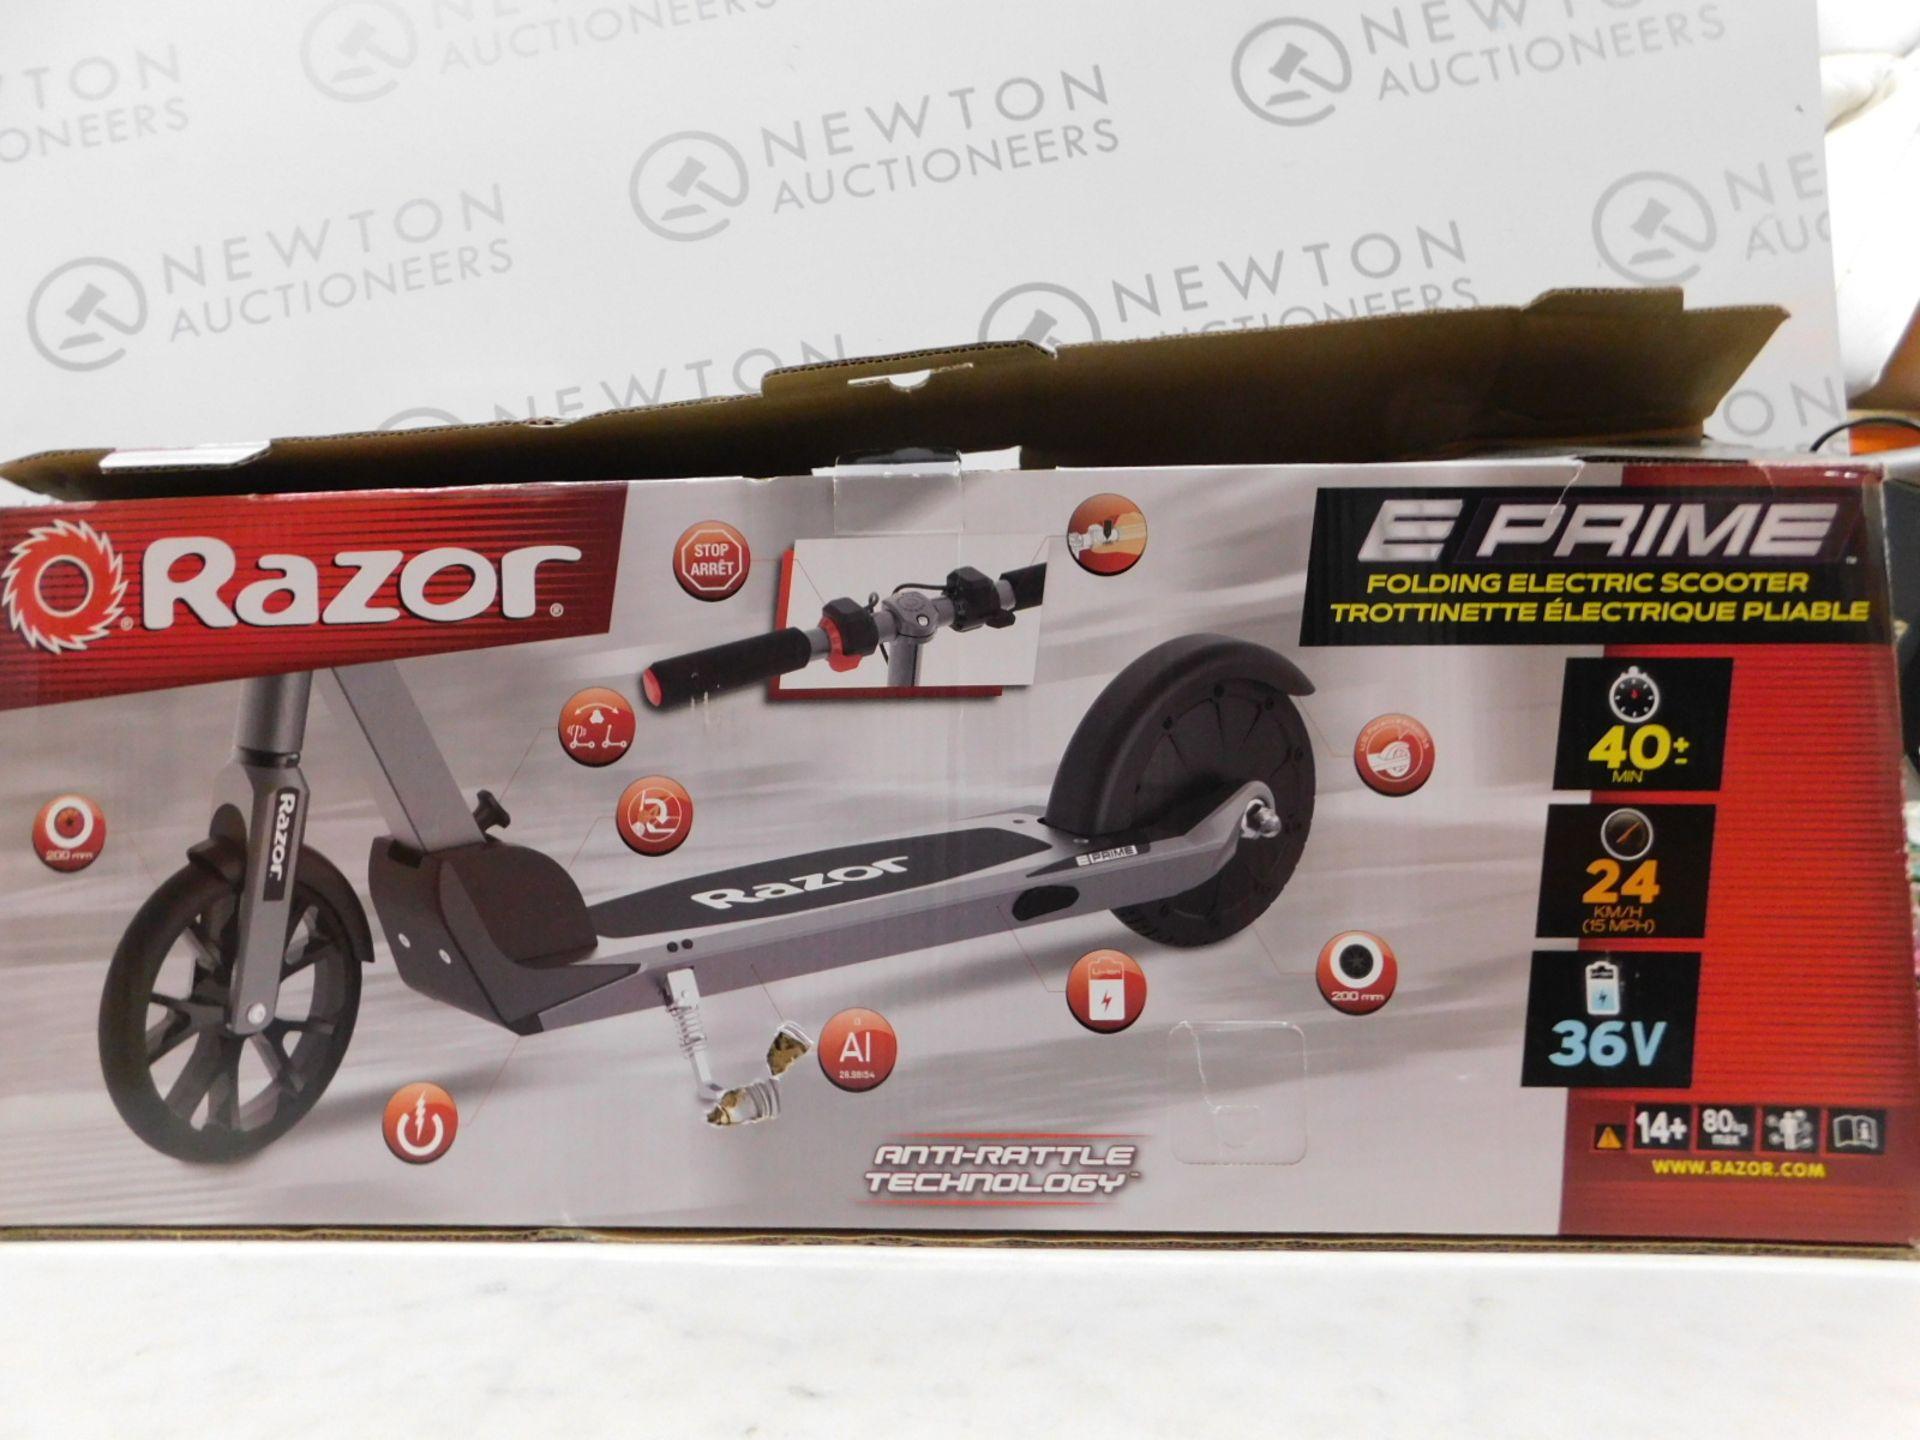 Lot 211 - 1 BOXED RAZOR E-PRIME FOLDING ELECTRIC SCOOTER RRP £399